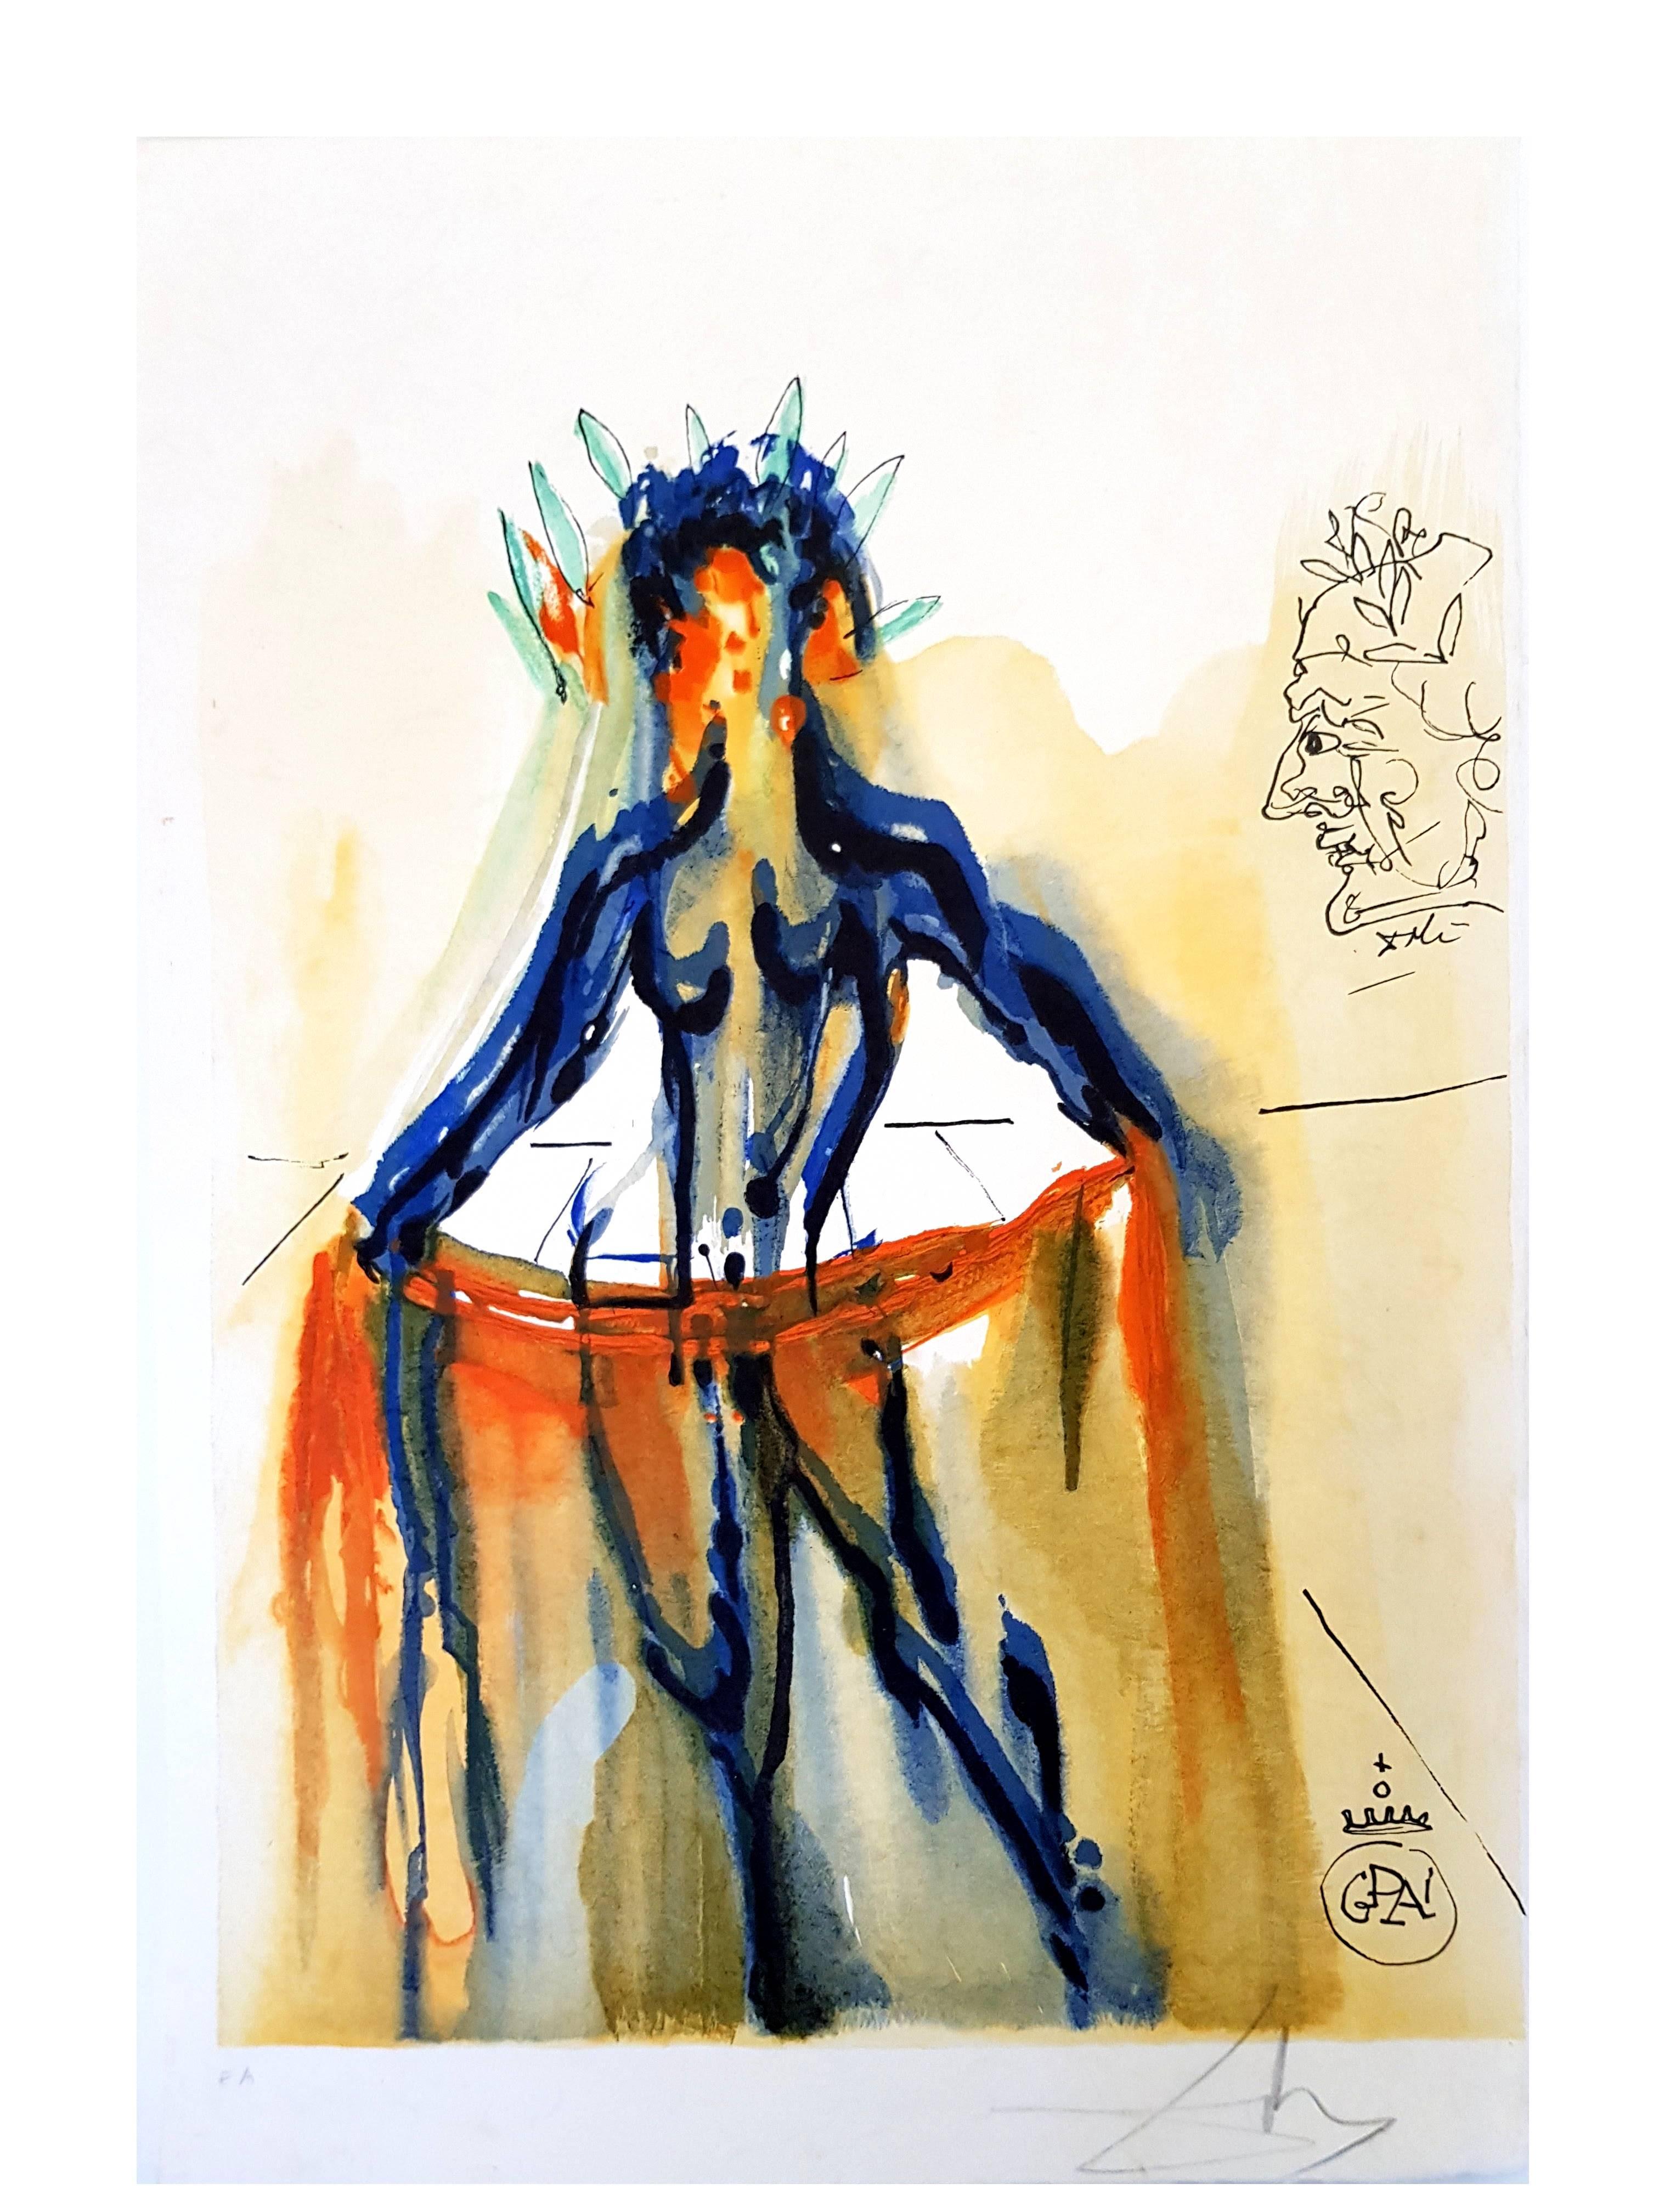 Salvador Dali - The Art of Loving - Handsigned Lithograph